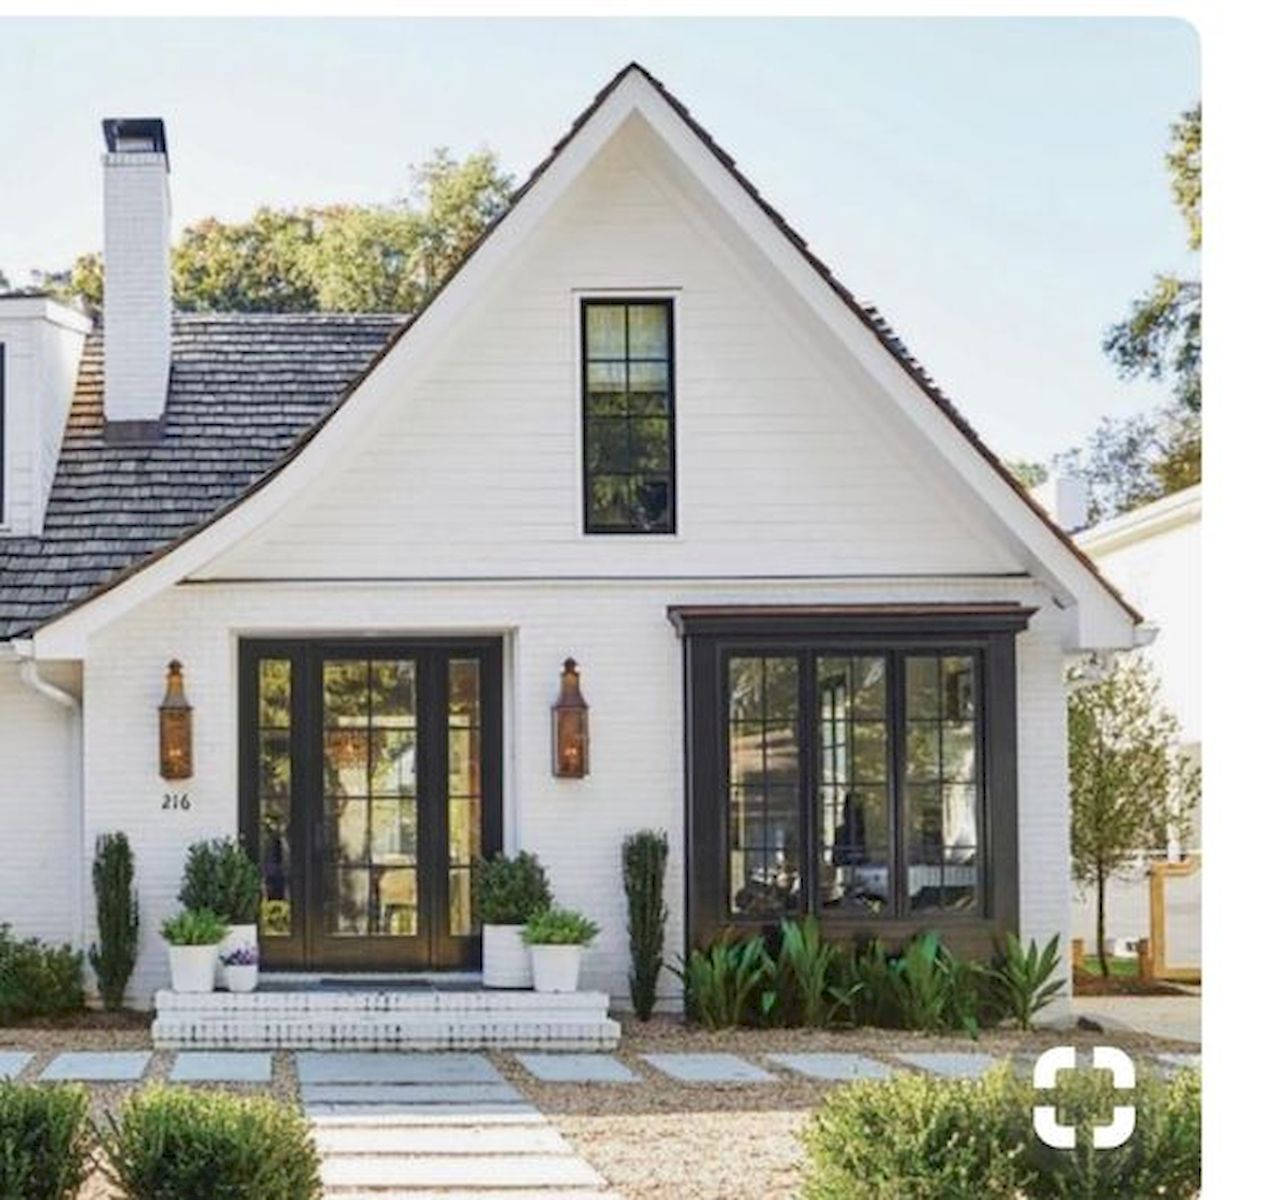 Small Modern Home Exteriors: 33 Beautiful Modern Farmhouse Exterior Design Ideas